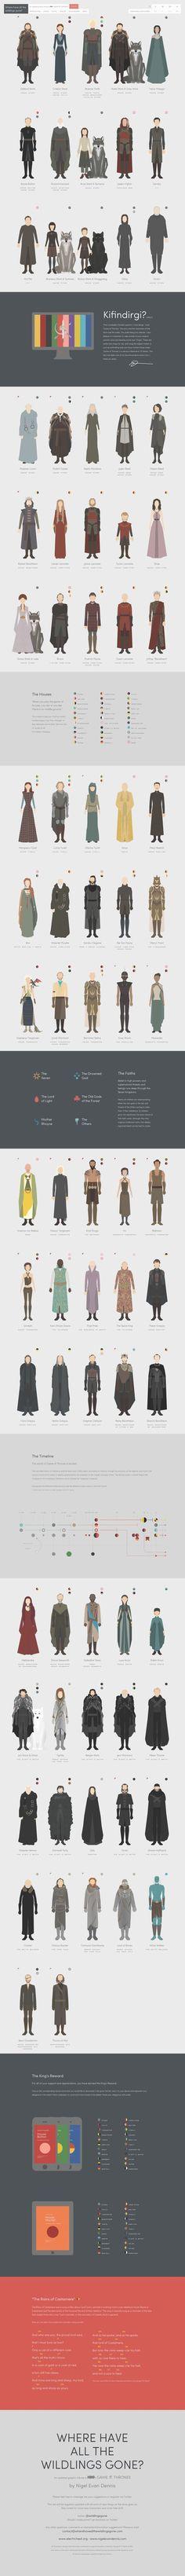 Game of Thrones website infographic by Nigel Evan Dennis